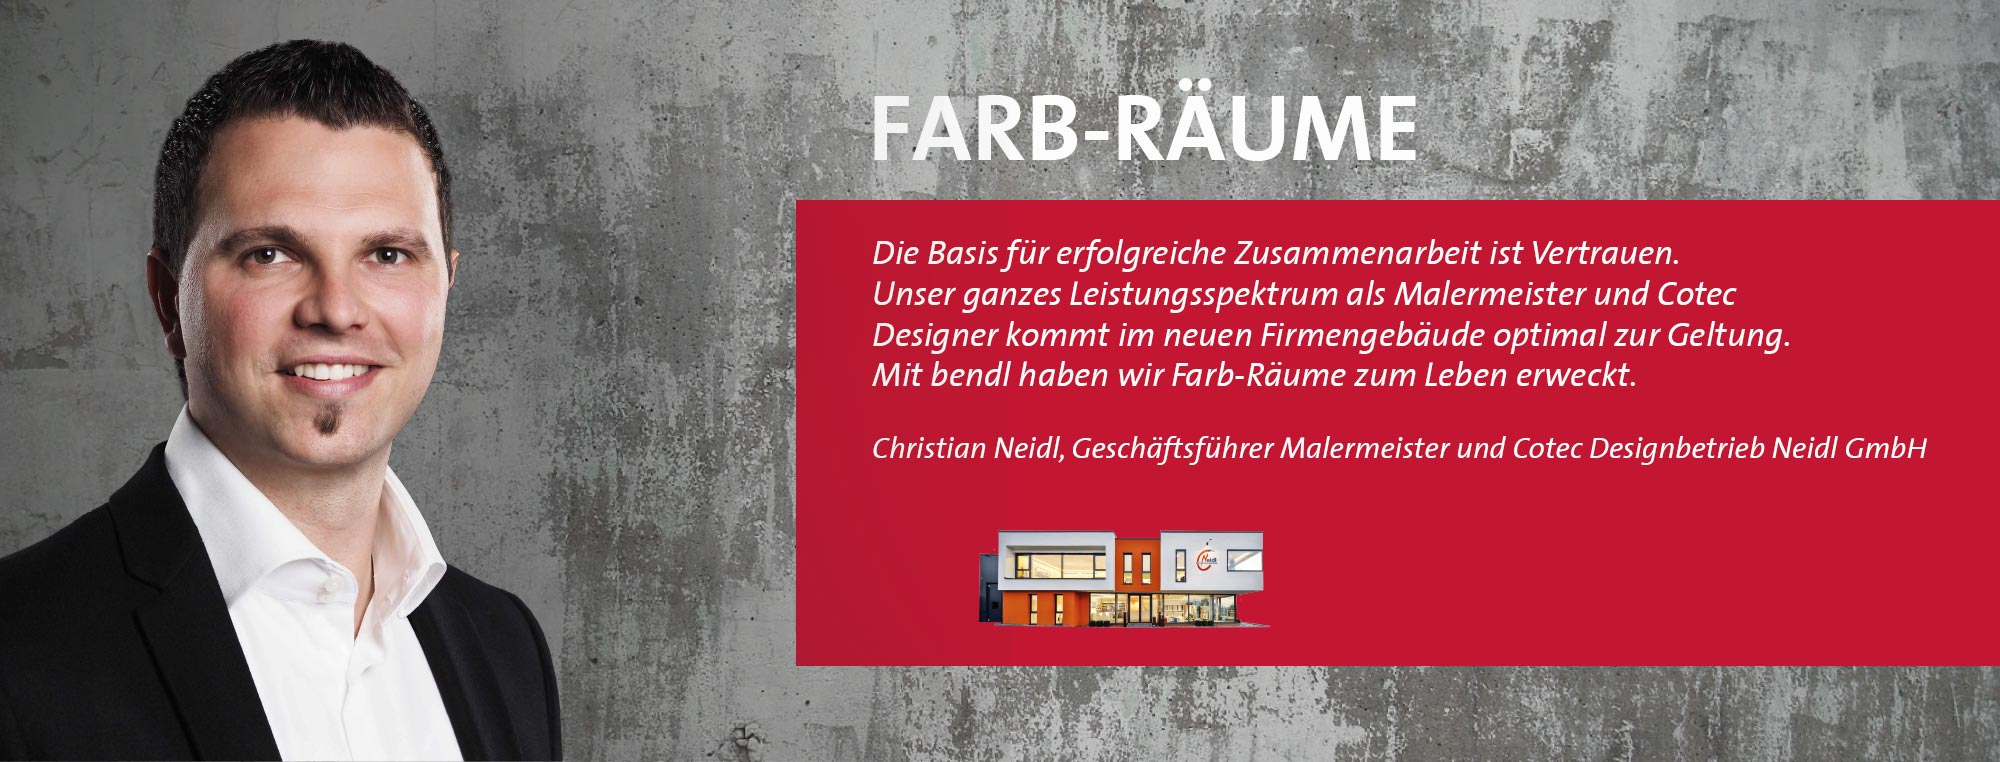 Christian Neidl - Malermeister und Cotecdesignbetrieb Neidl GmbH